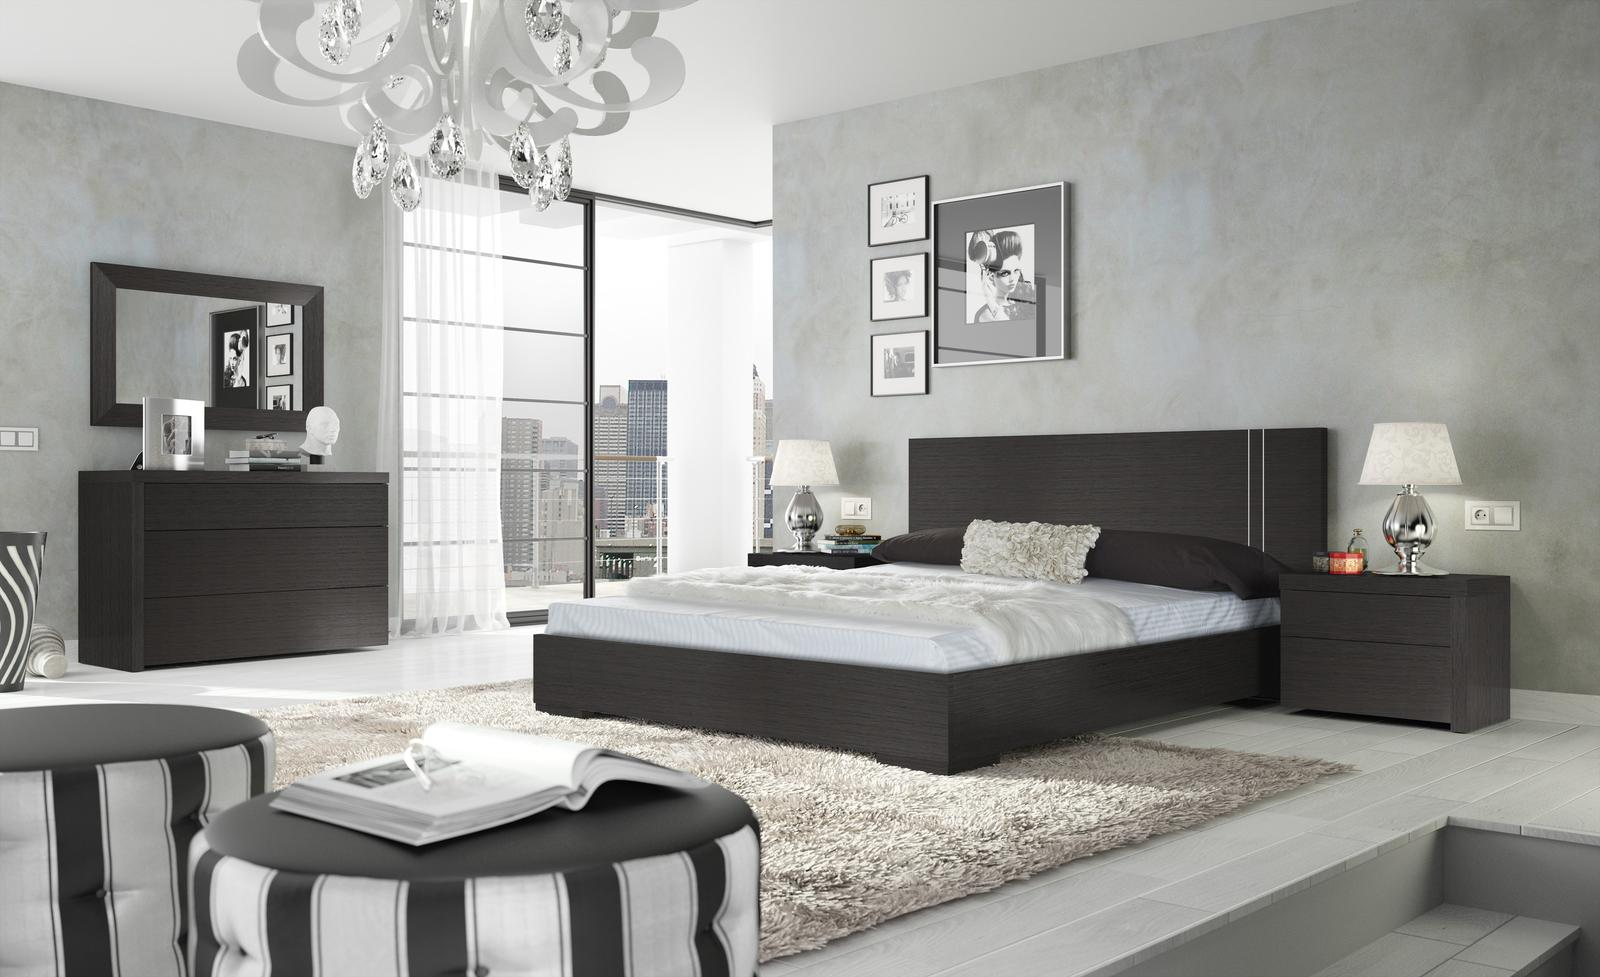 chambres contemporaines lits chevets moblinea. Black Bedroom Furniture Sets. Home Design Ideas